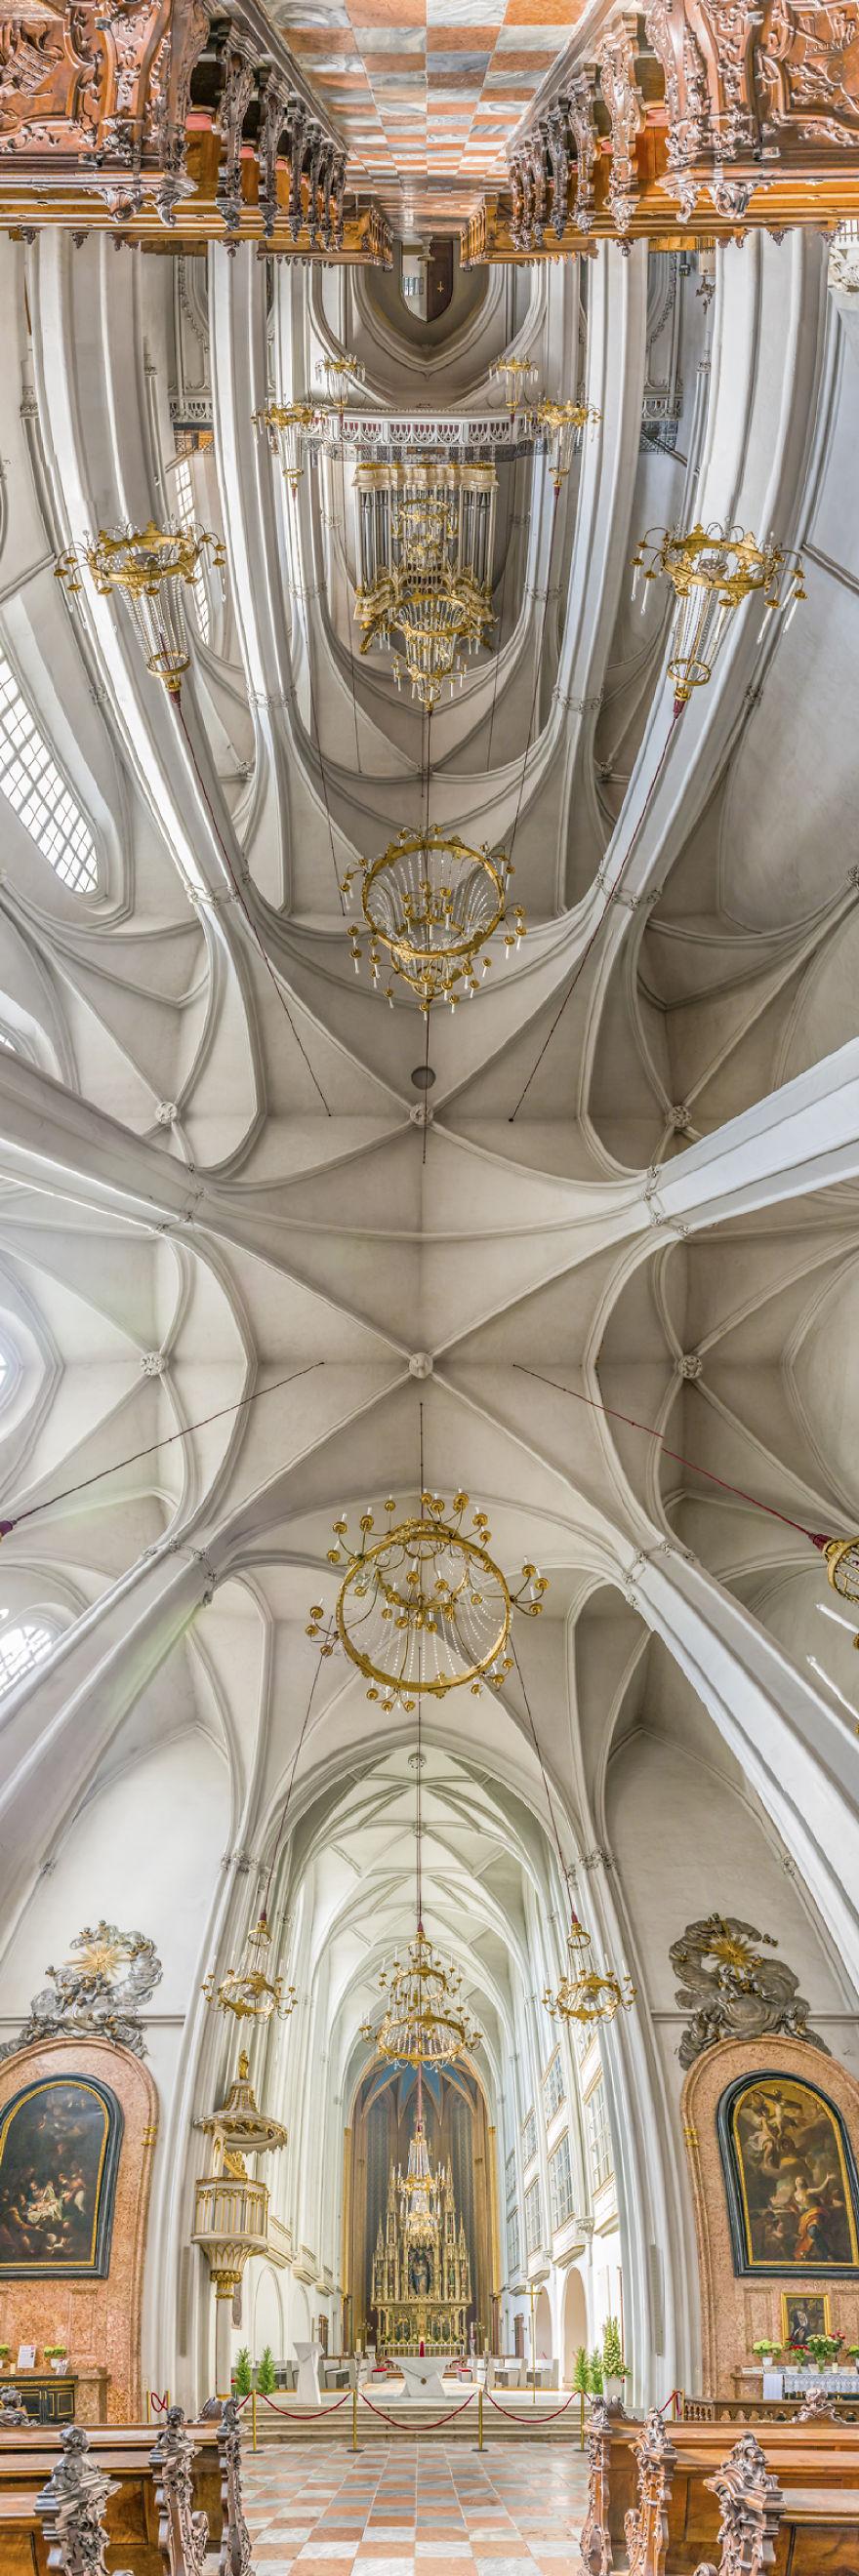 catedrales fotografiadas vertical 11